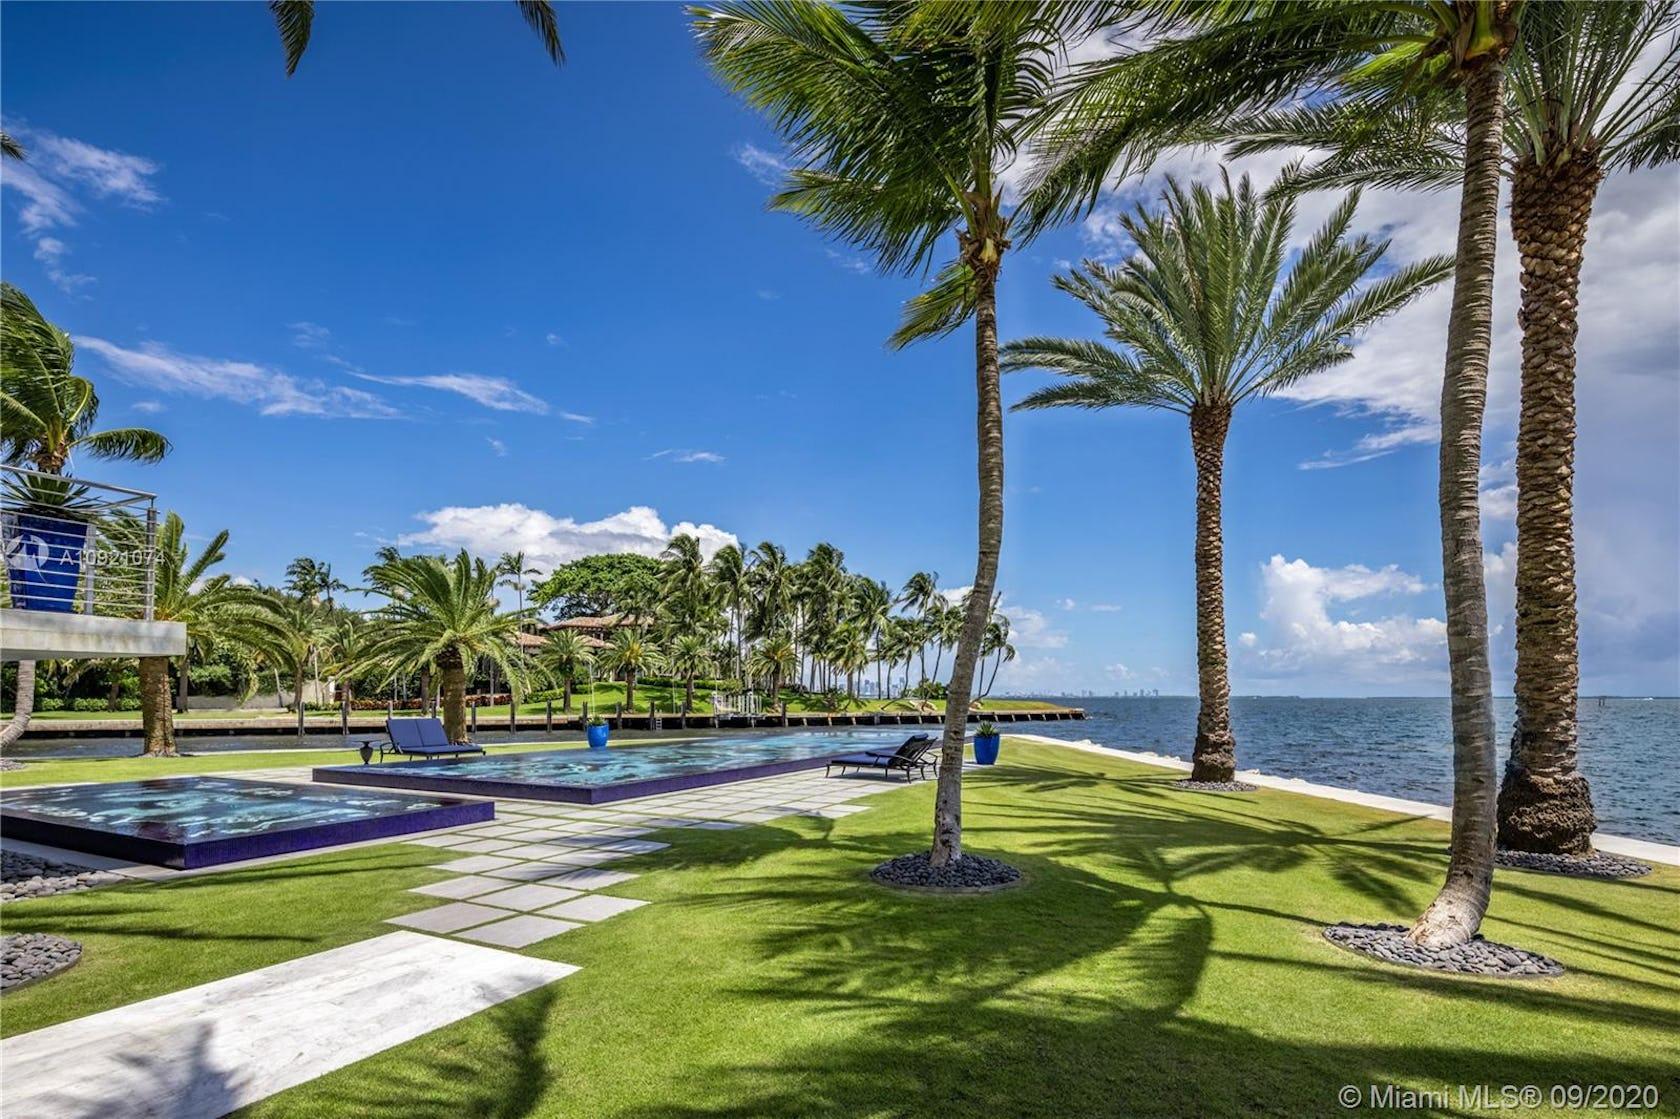 summer grass plant tropical palm tree tree arecaceae